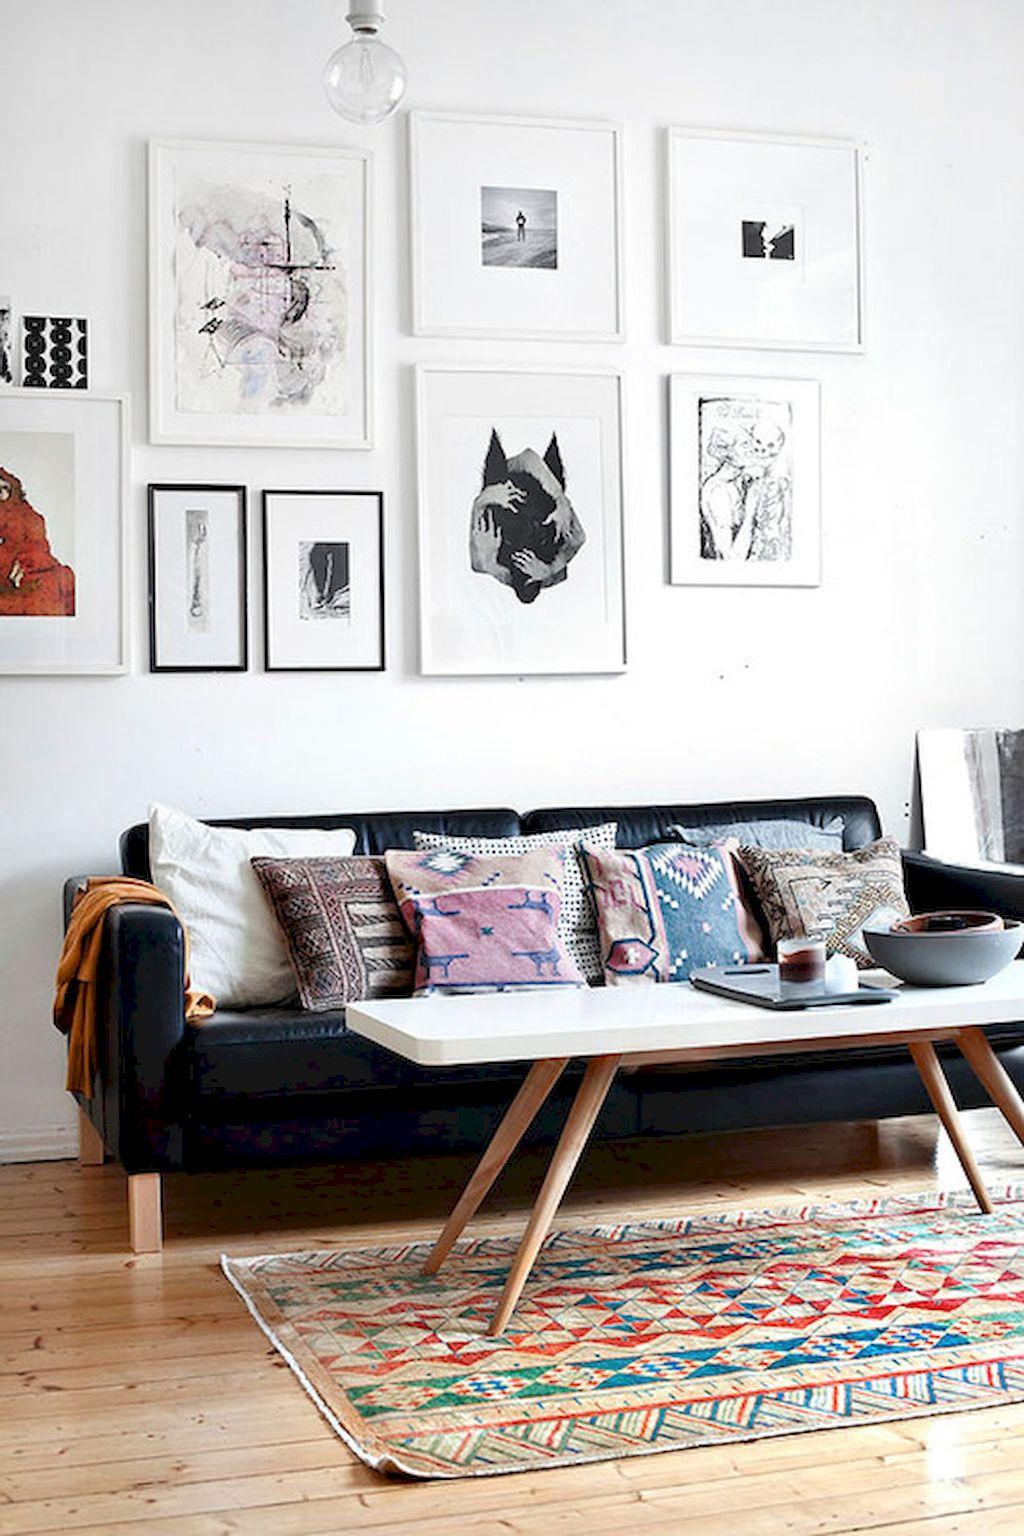 5 Amazing Black Leather Sofas For Your Luxury Living Room luxury living room 5 Amazing Black Leather Sofas For Your Luxury Living Room 5 Amazing Black Leather Sofas For Your Luxury Living Room 3 1